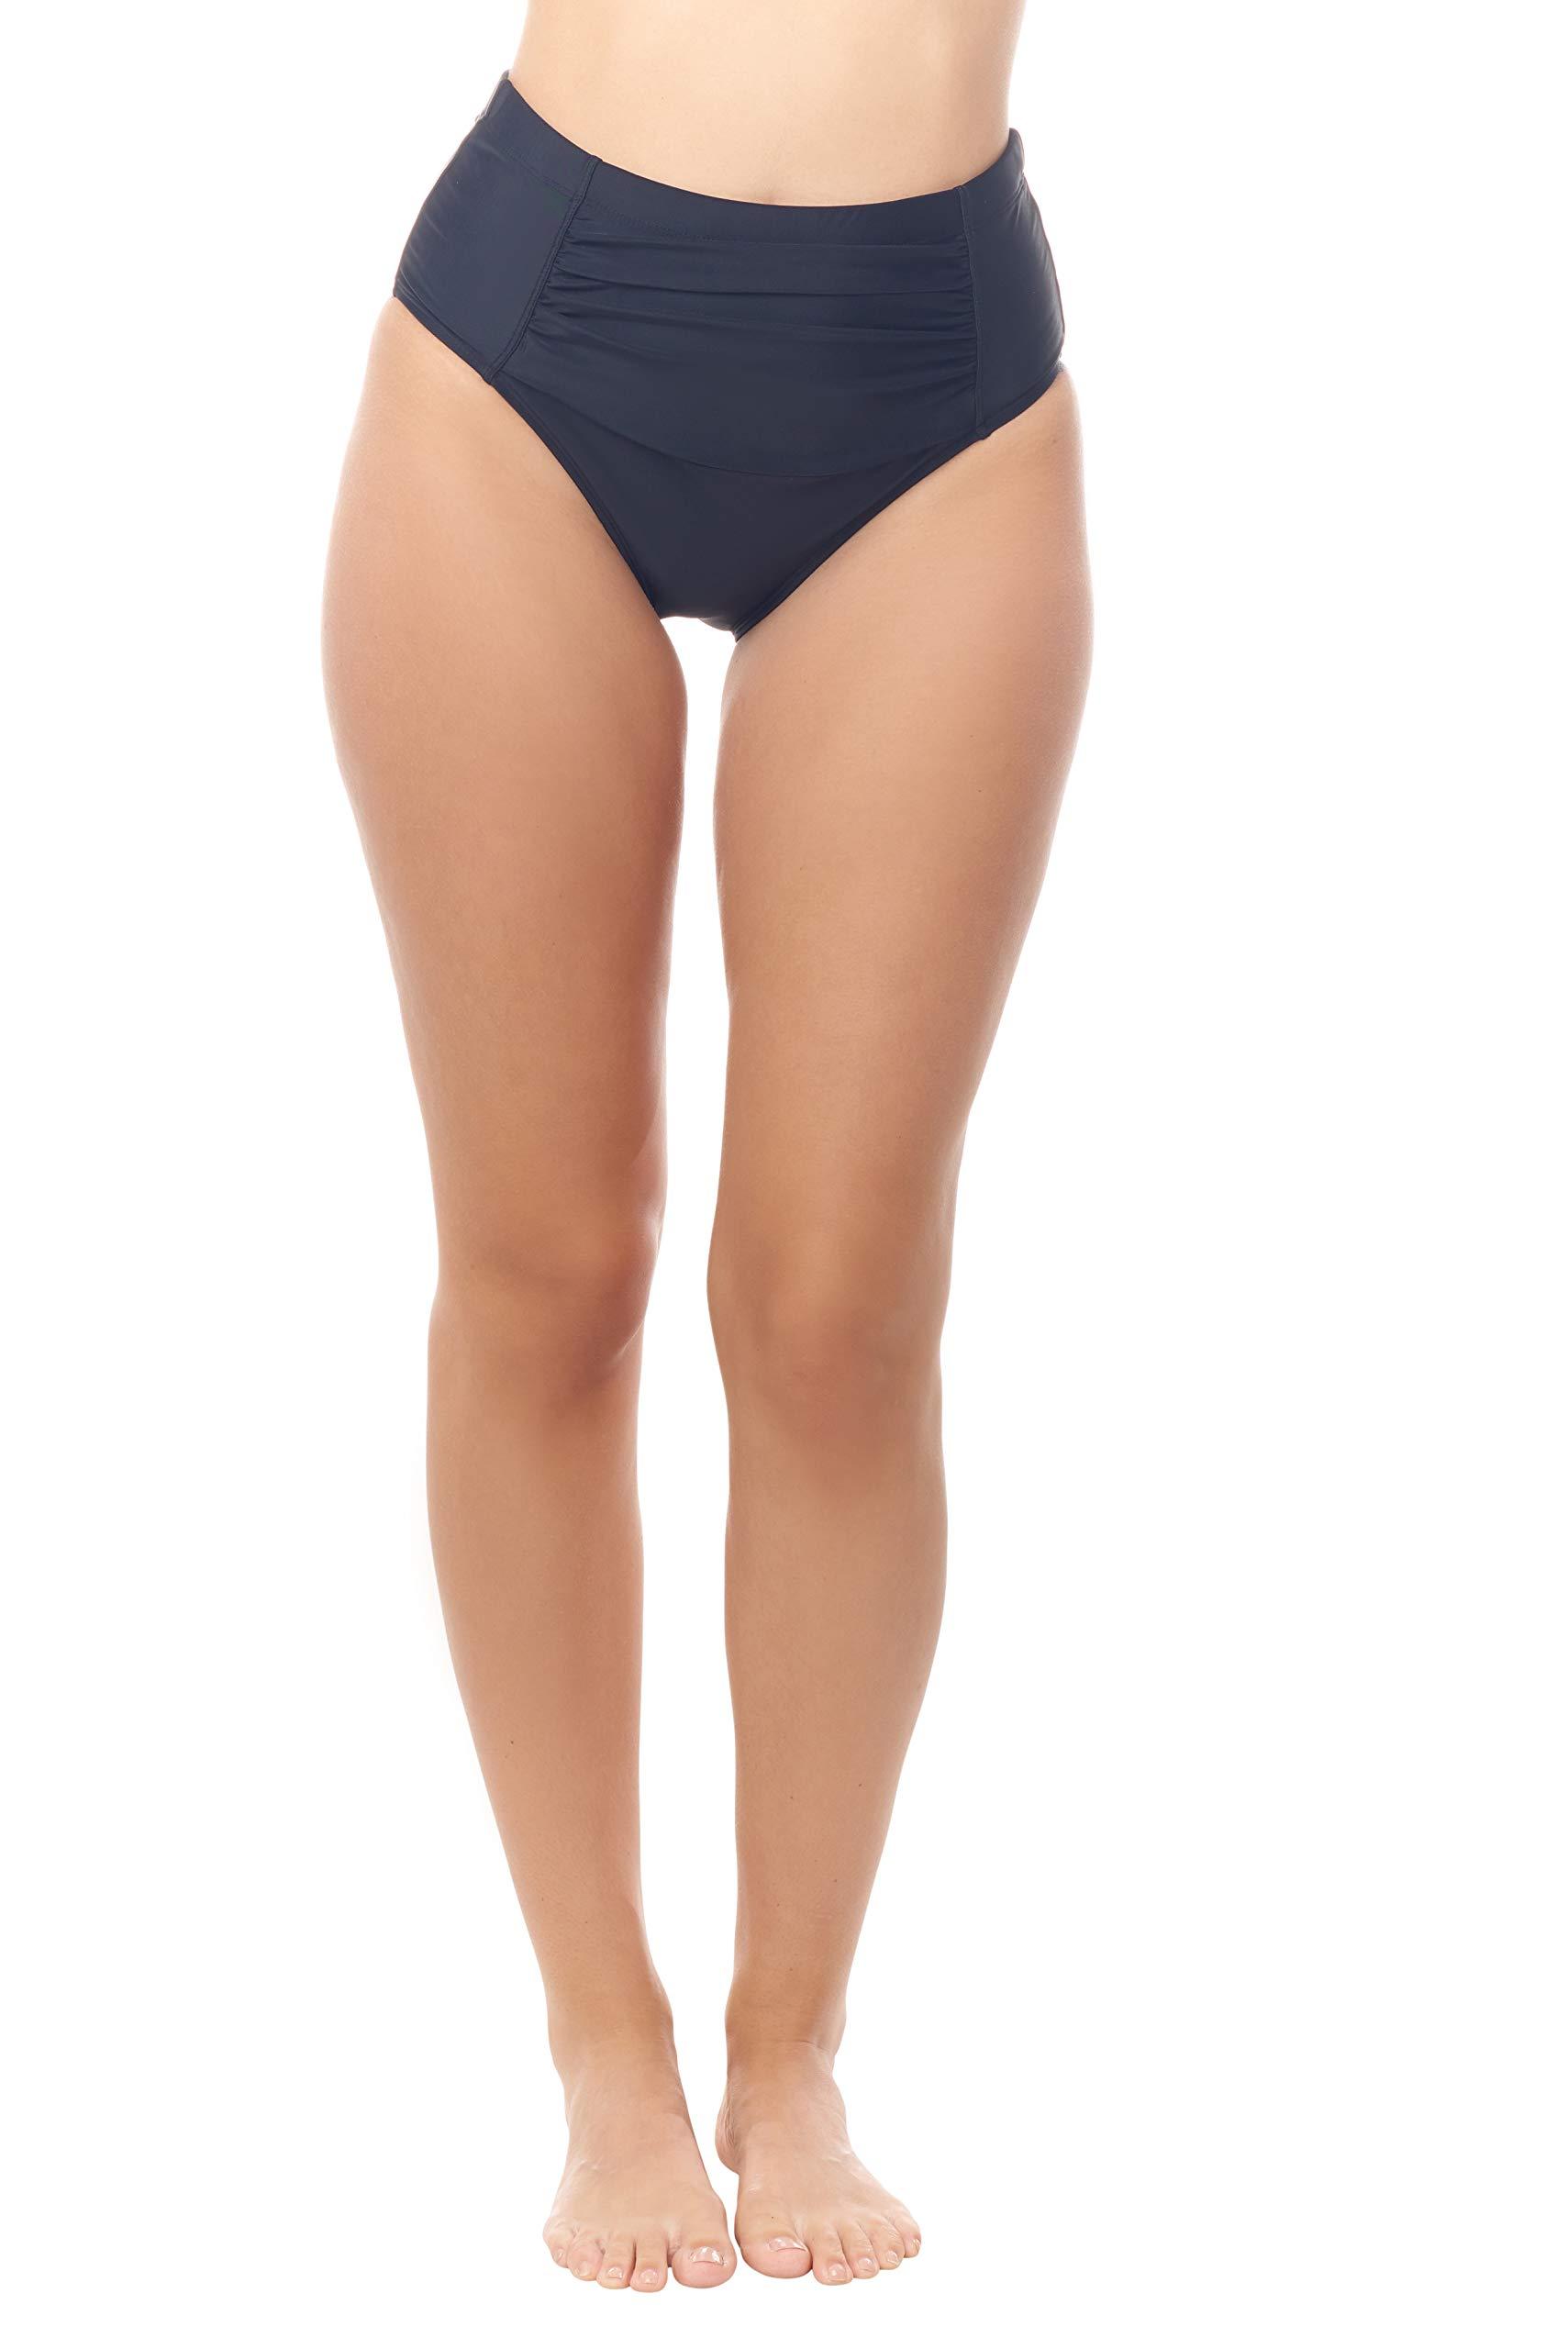 Love My Curves Ruched High-Waist Swim Suit | Tummy Control Bikini Bottom